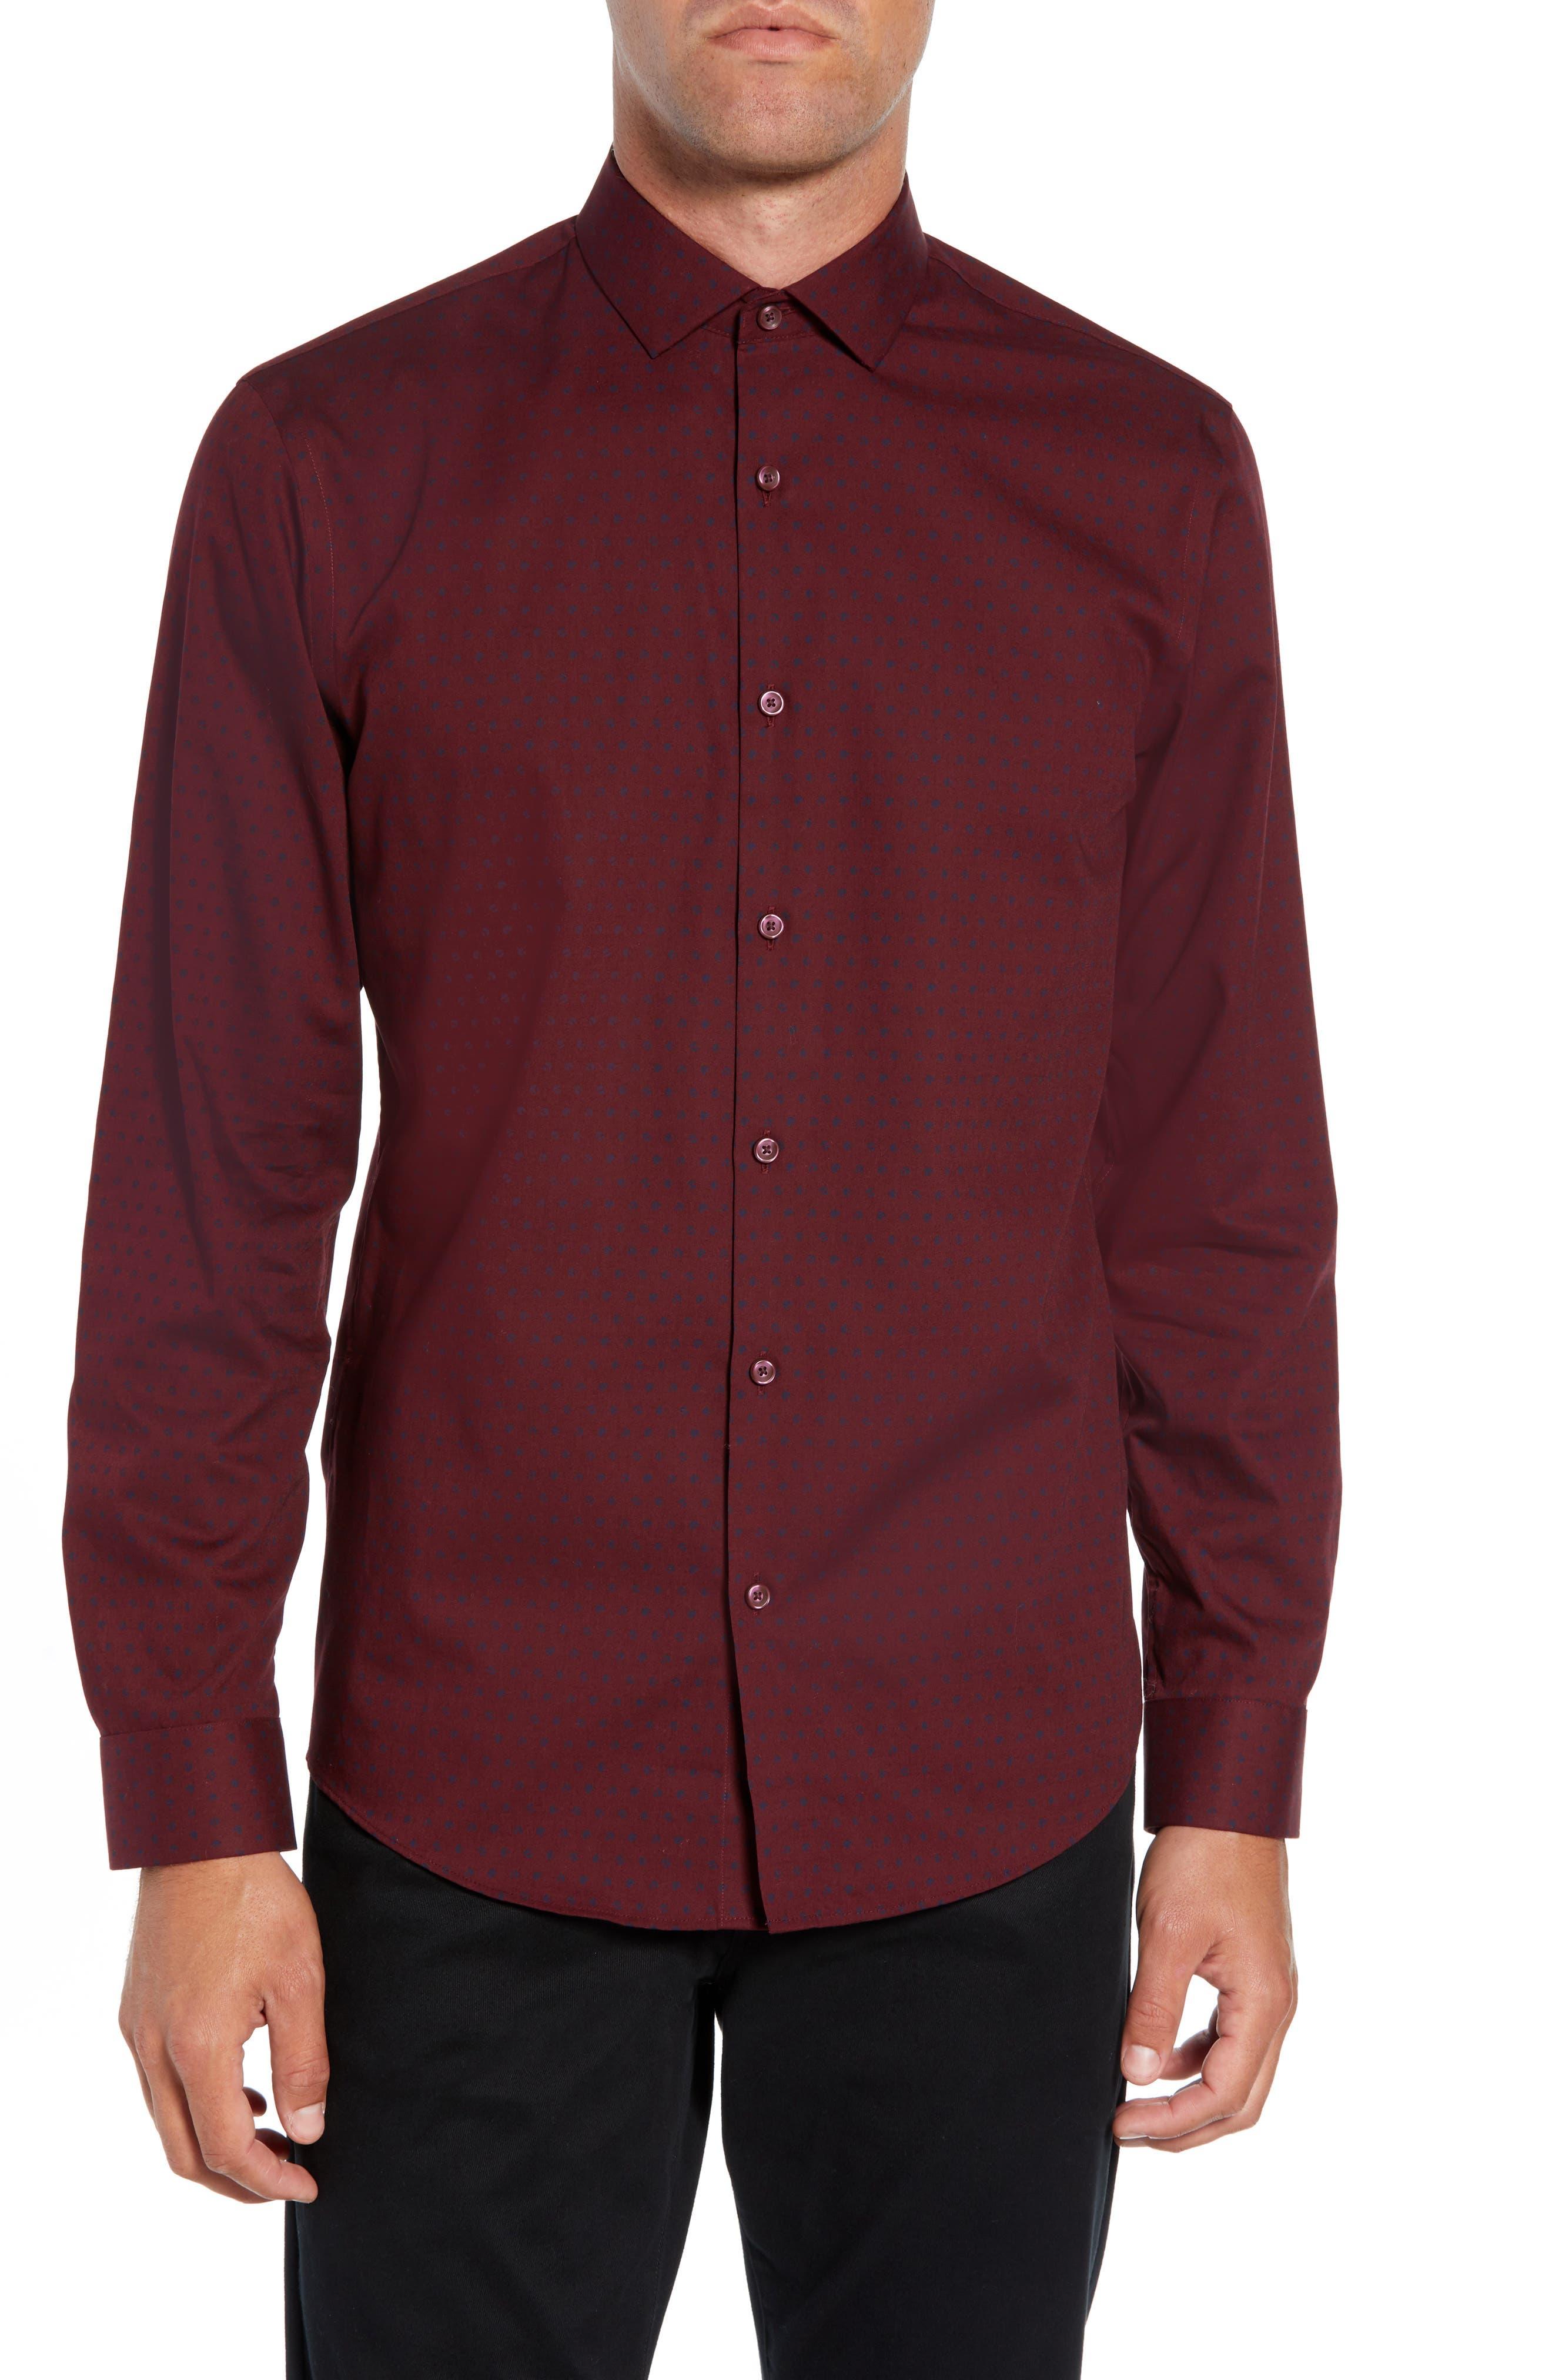 Slim Fit Non Iron Polka Dot Sport Shirt,                             Main thumbnail 1, color,                             BURGUNDY ROYALE NAVY DOT